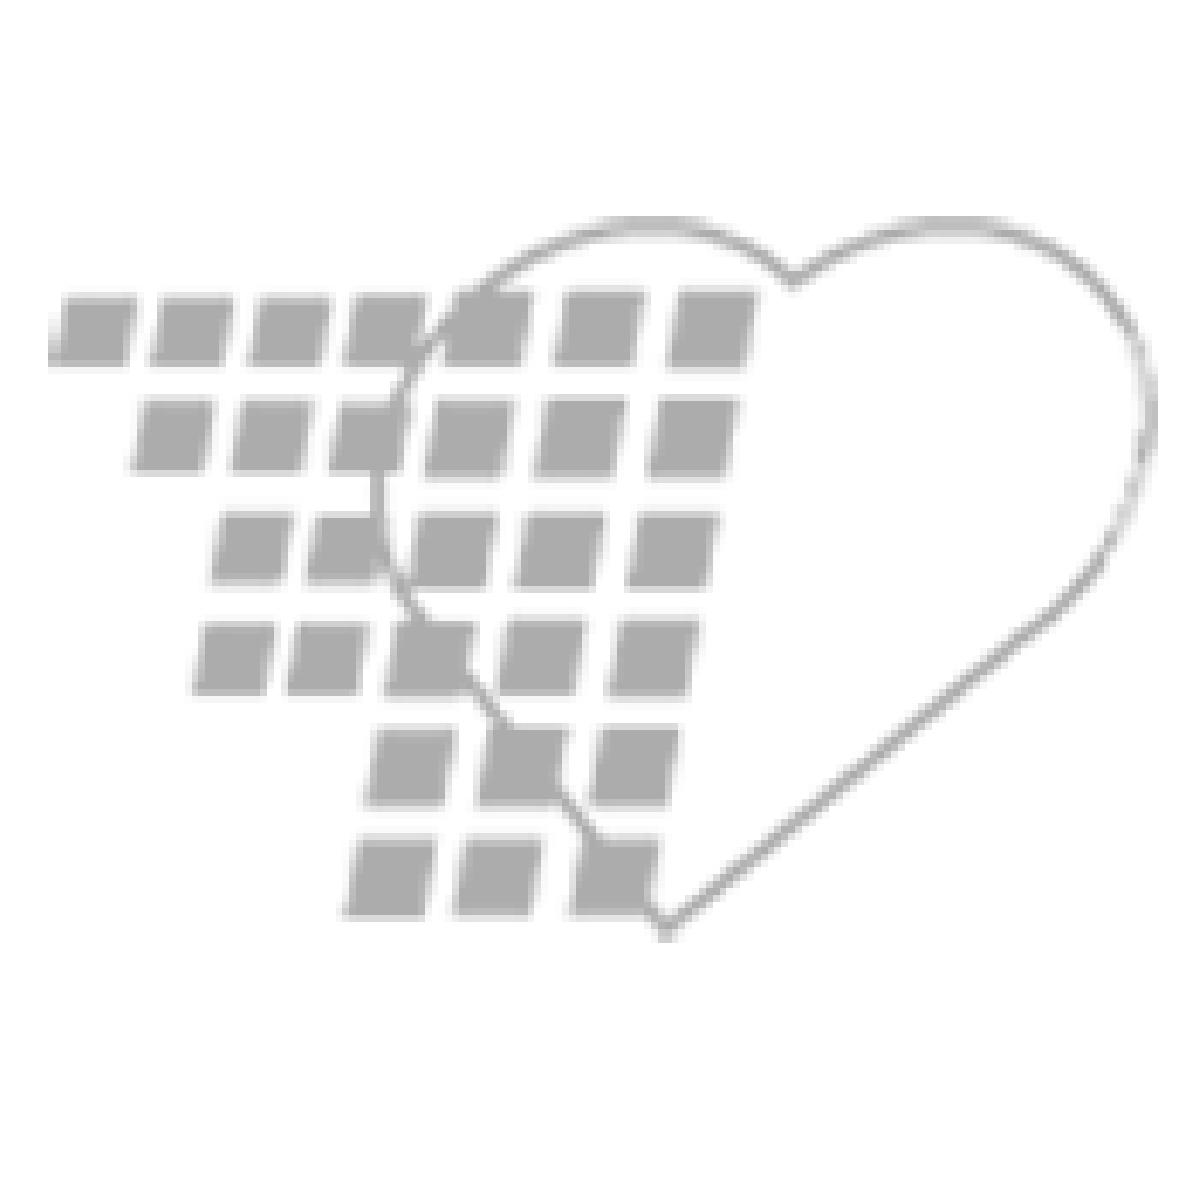 "05-51-9505 3M™ Tegaderm Transparent Dressing 2 3/8"" x  2 3/4"""